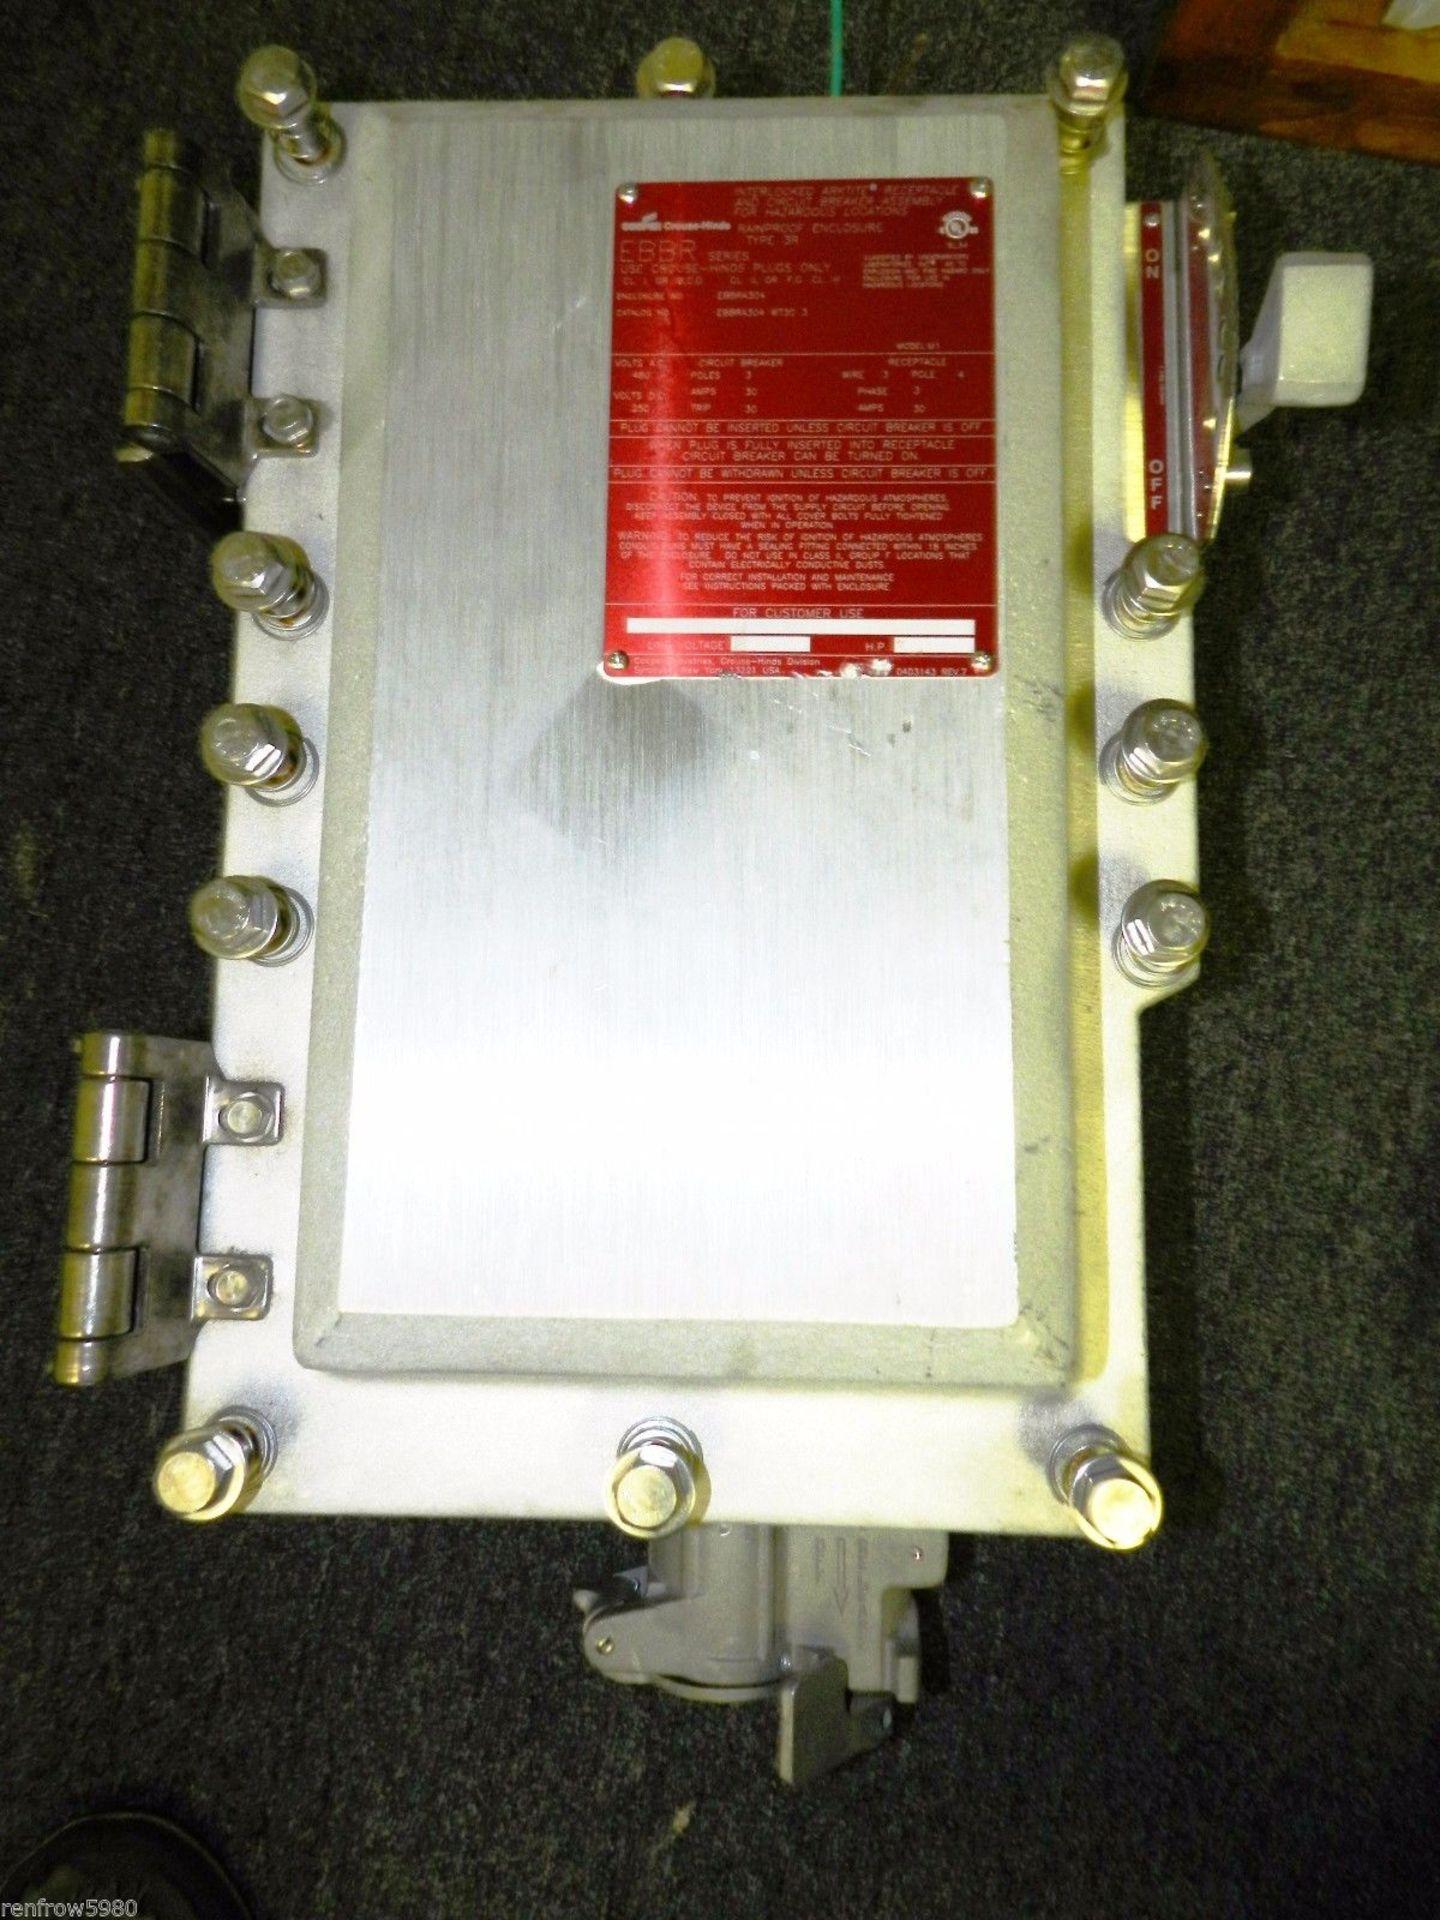 Lot 12 - Lot of 2 Crouse Hinds Arktite Interlock Receptacle w/30 Amp Breaker